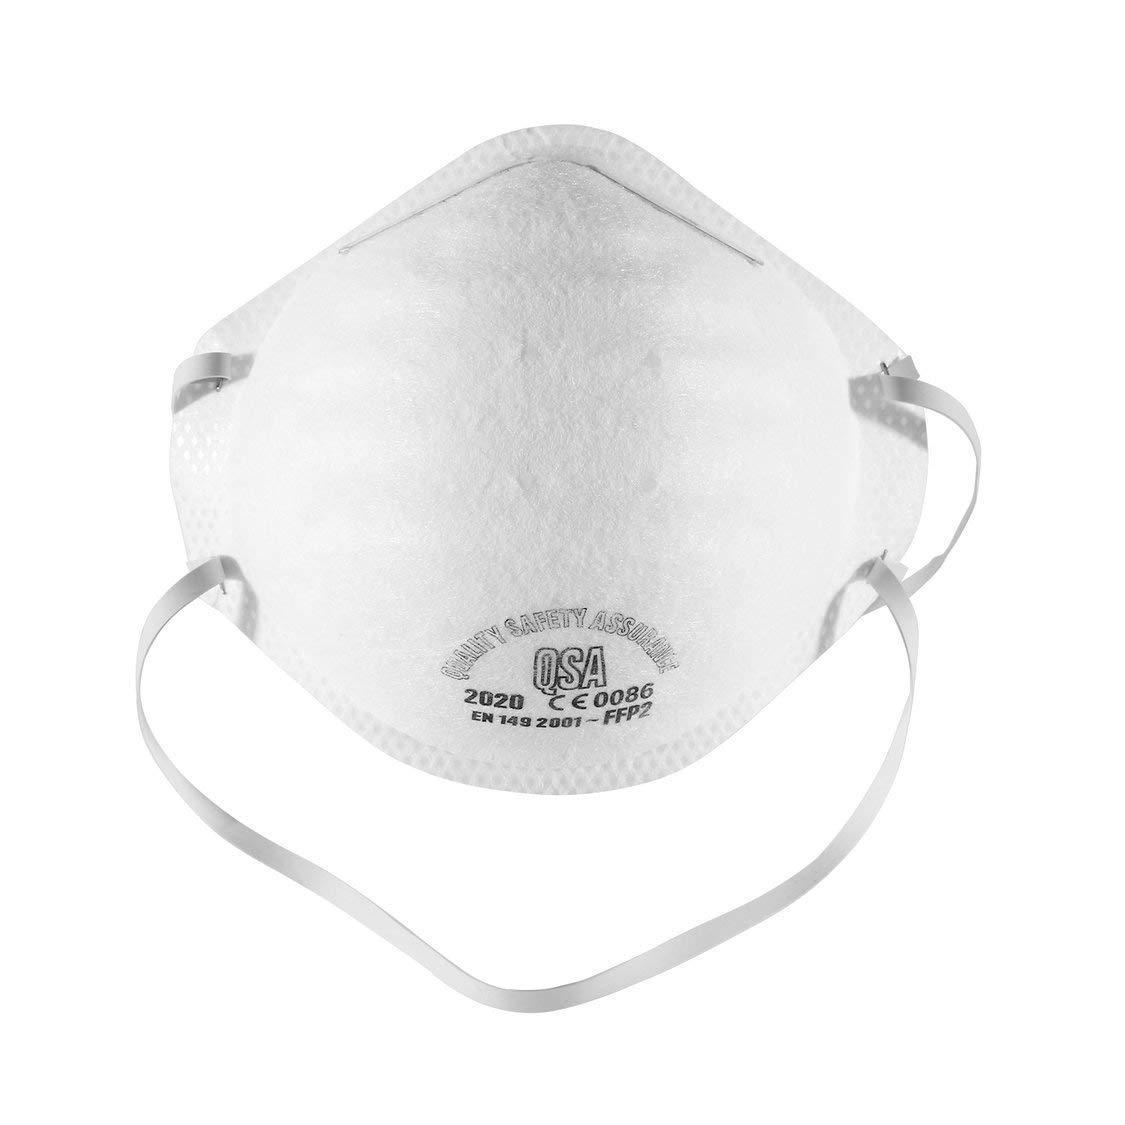 Máscara antipolución N95, con válvula de Capas Filtro FFP2 98% Bacterias Anti PM2.5 Neumonía Protección contra la Gripe Máscara de polución contra el P